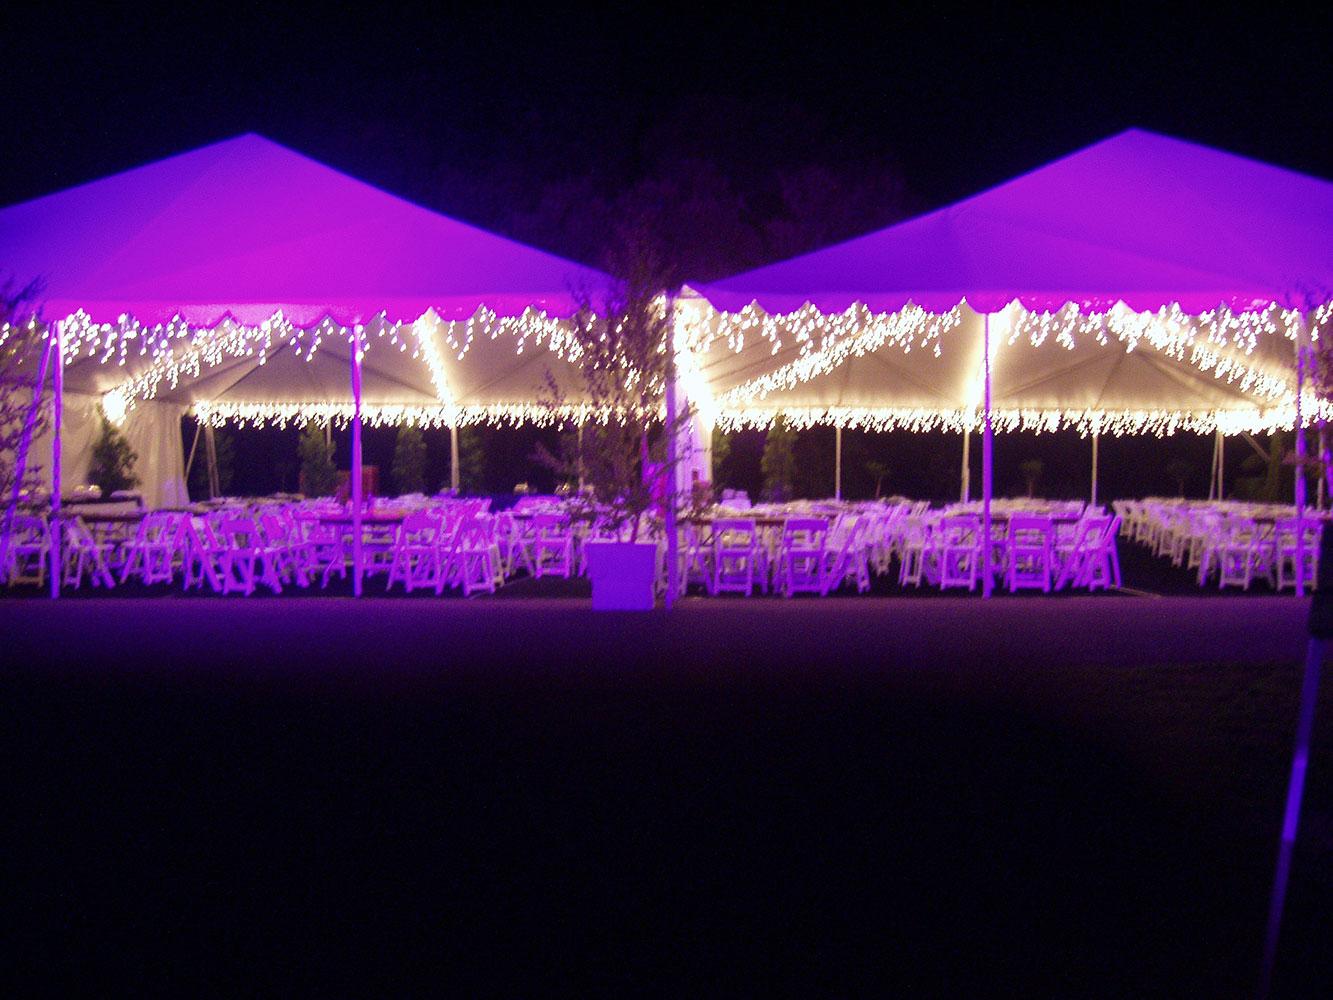 Neverland---Decor-and-Lighting